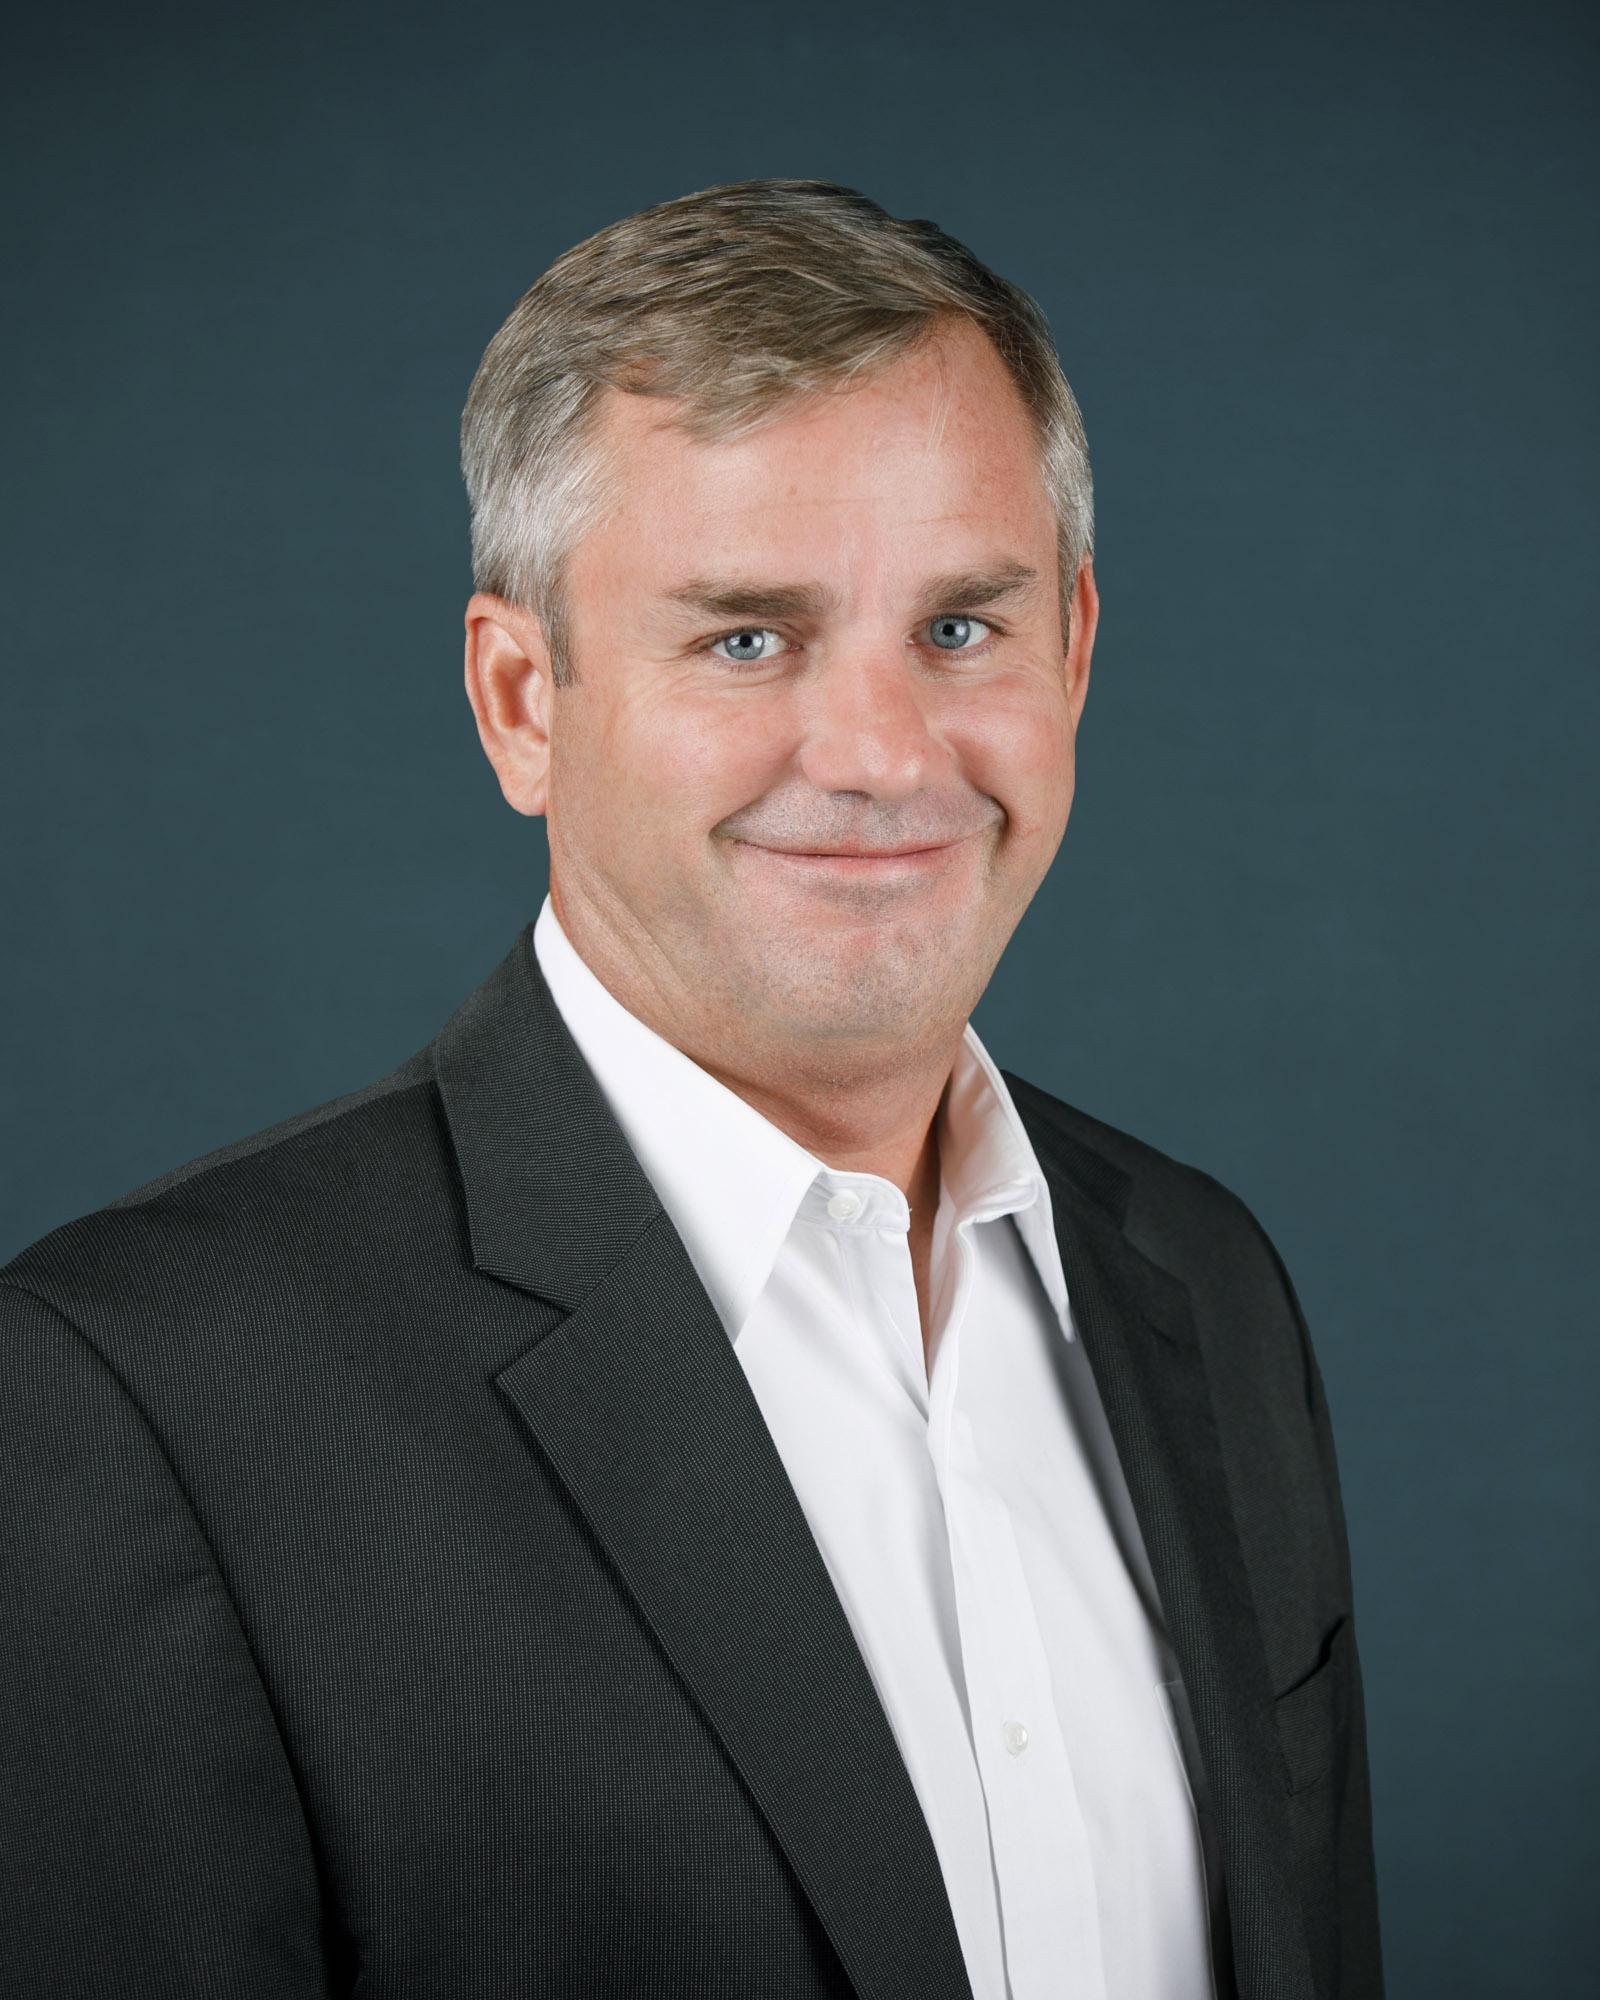 David Proctor